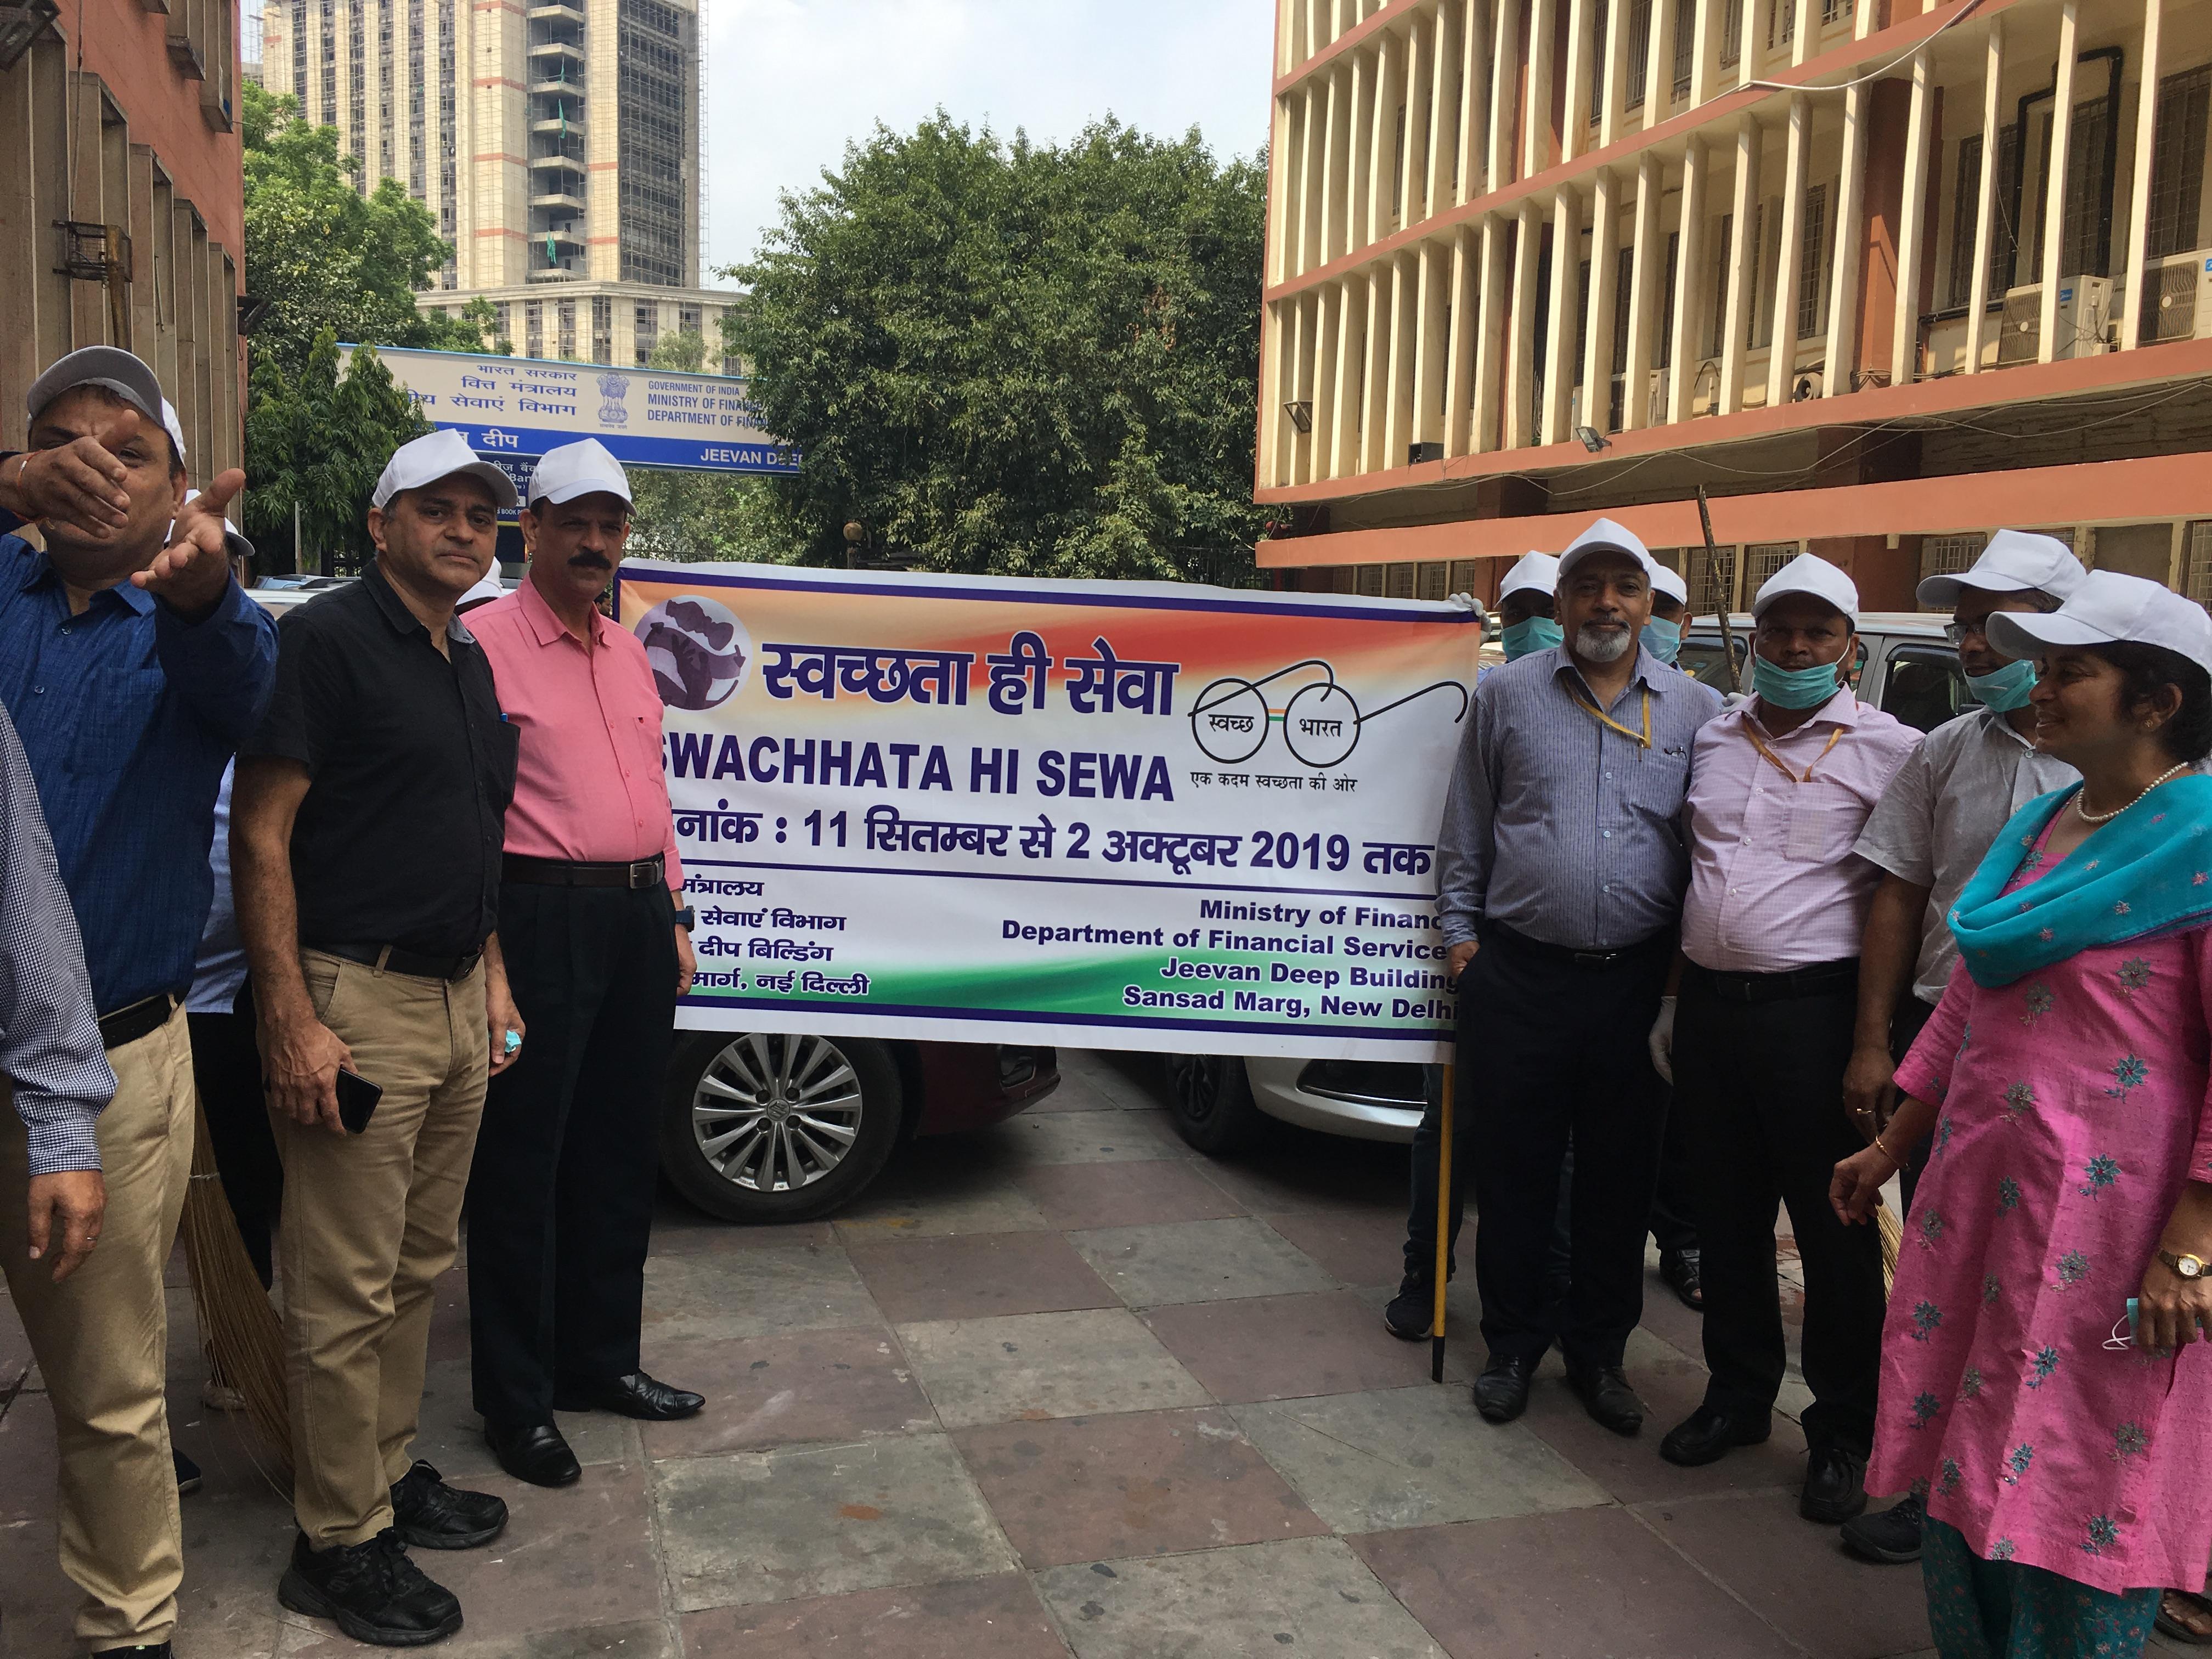 Swachhata Hi Seva Campaign, 2019 from 11.09.2019 to 02.10.2019